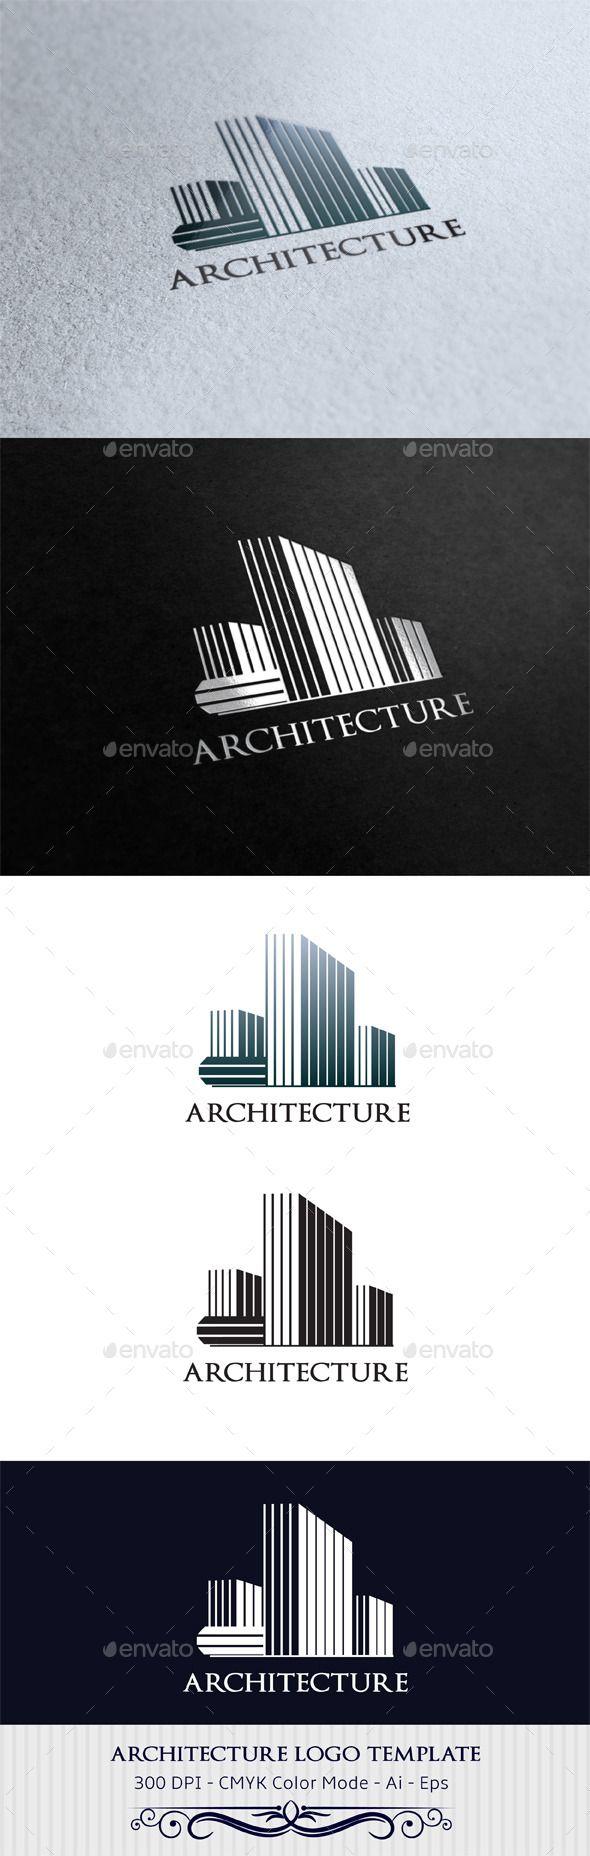 Architecture Logo Design Template Vector logotype